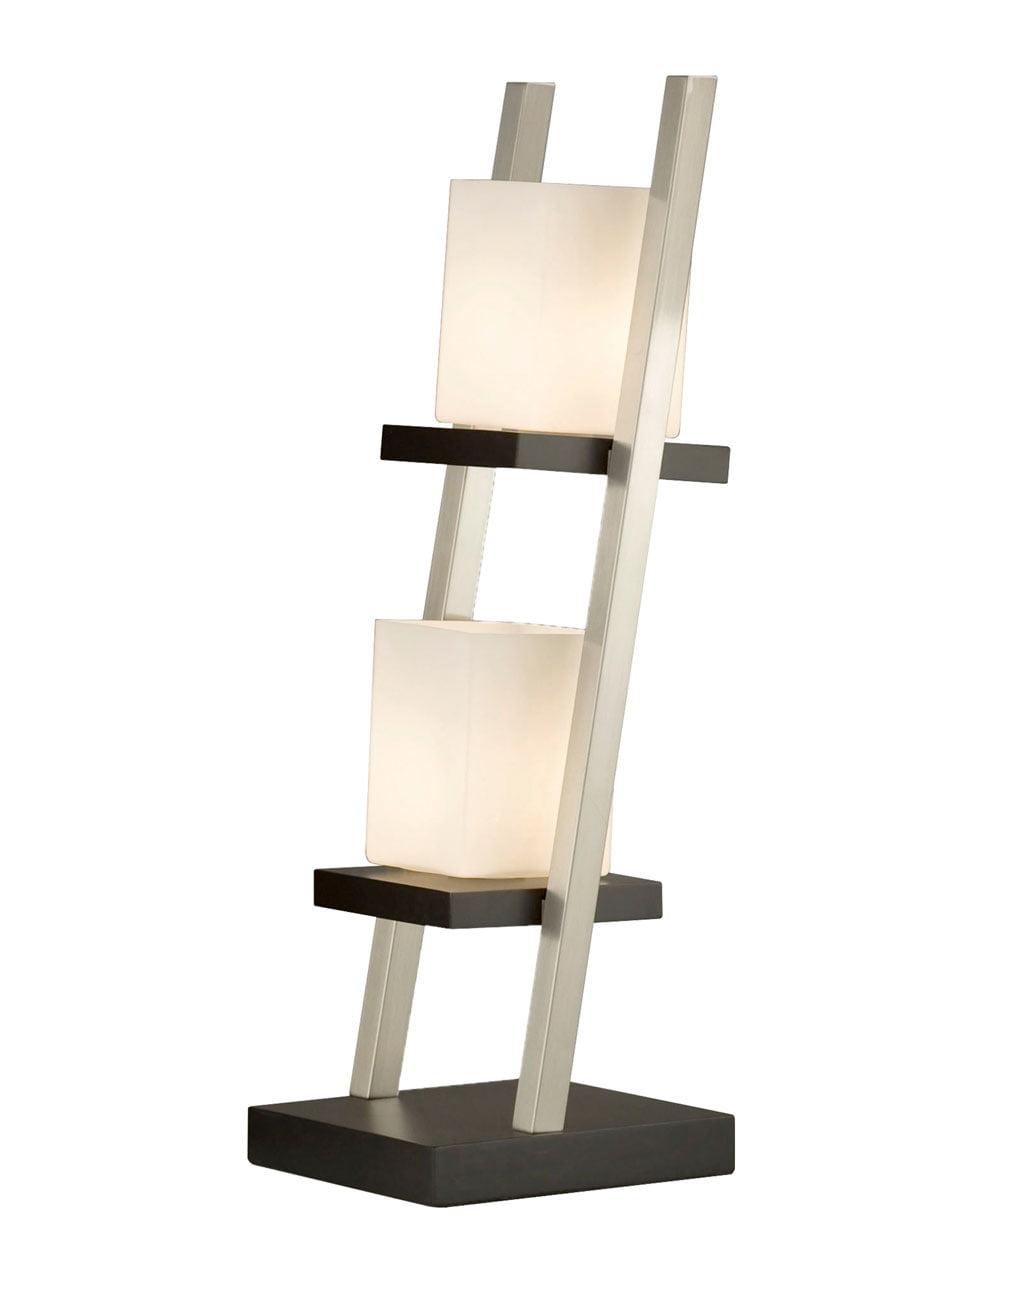 Escalier Table Lamp, Dark Brown